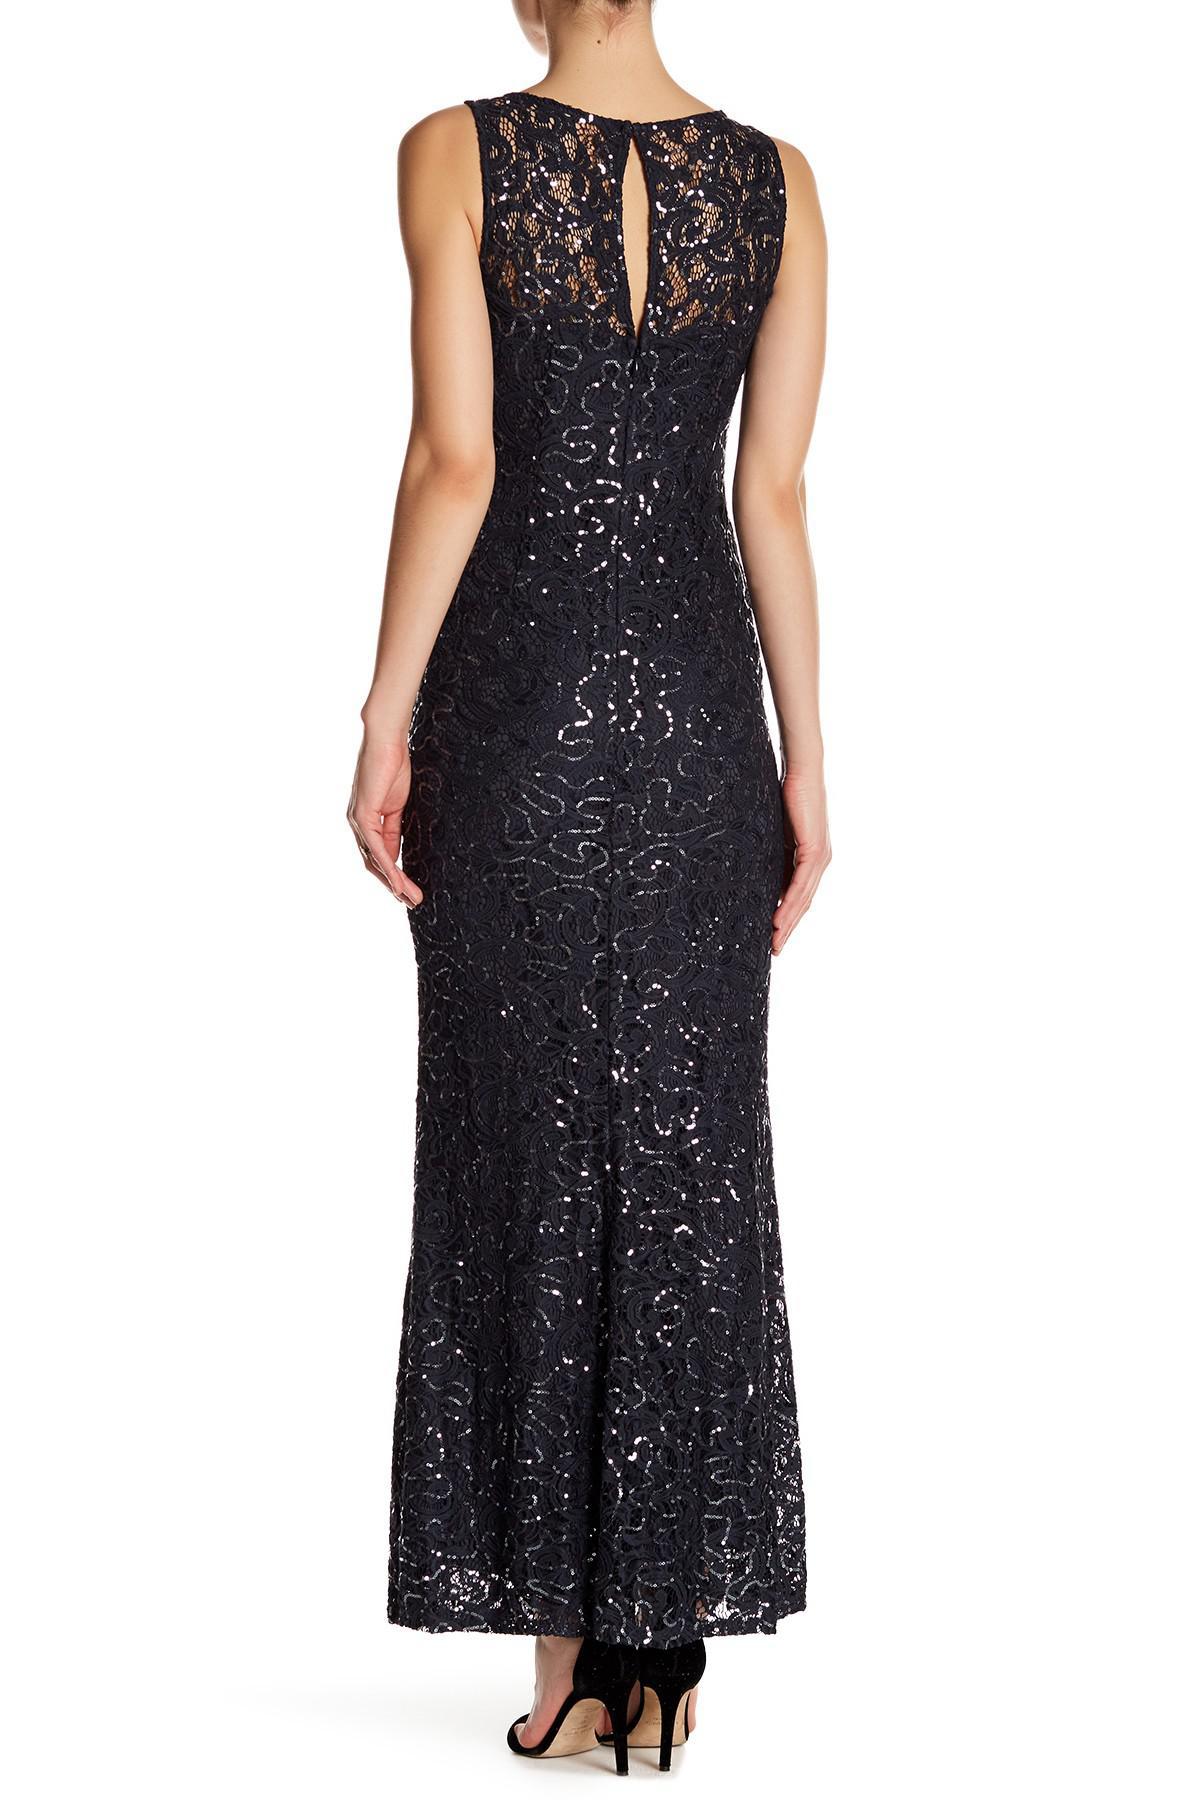 8597bbcf198dfd Marina - Black Sleeveless Illusion Yoke Lace Gown - Lyst. View fullscreen